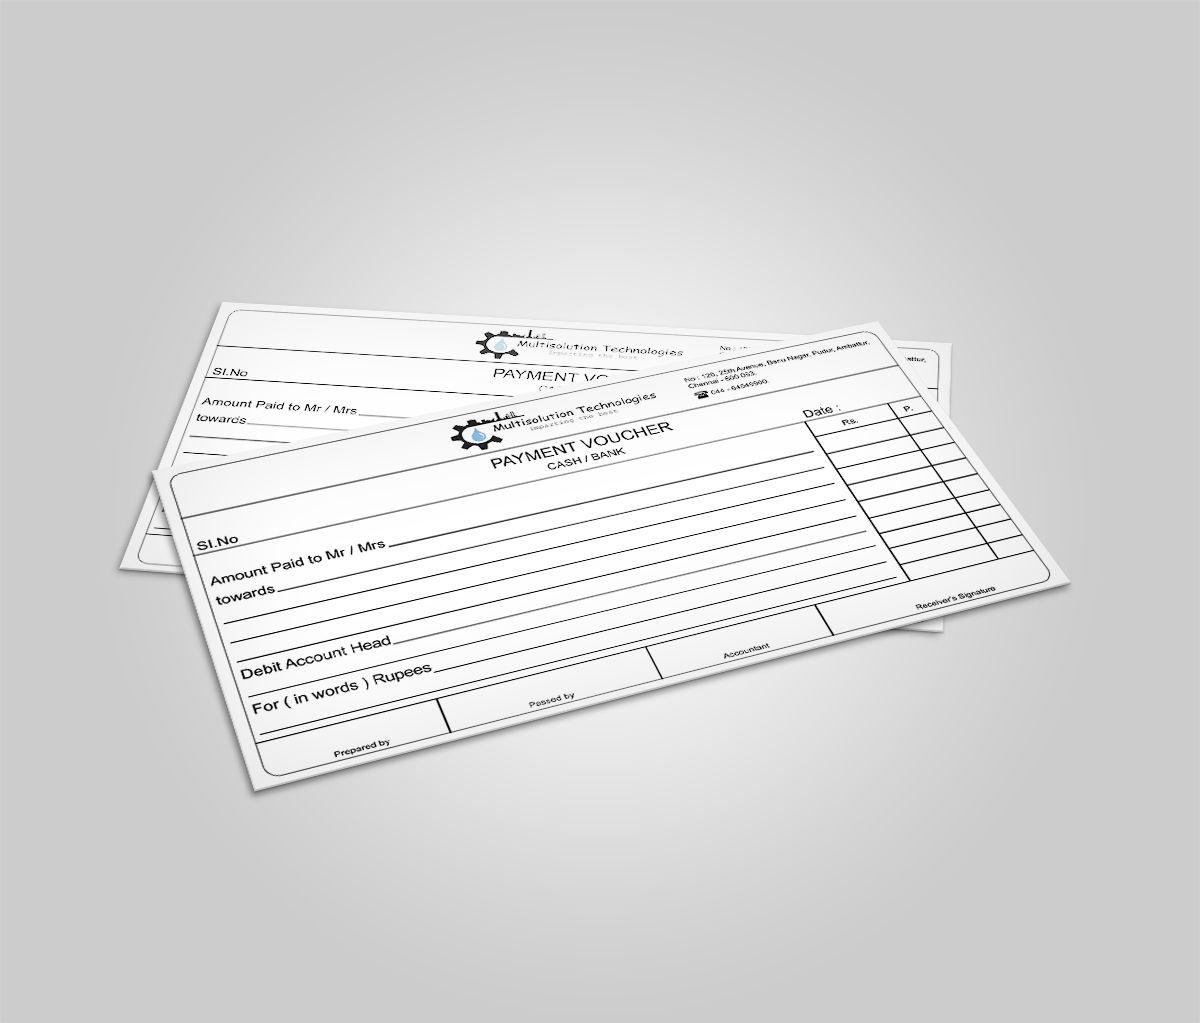 Pin By Pixelstudio On Payment Voucher